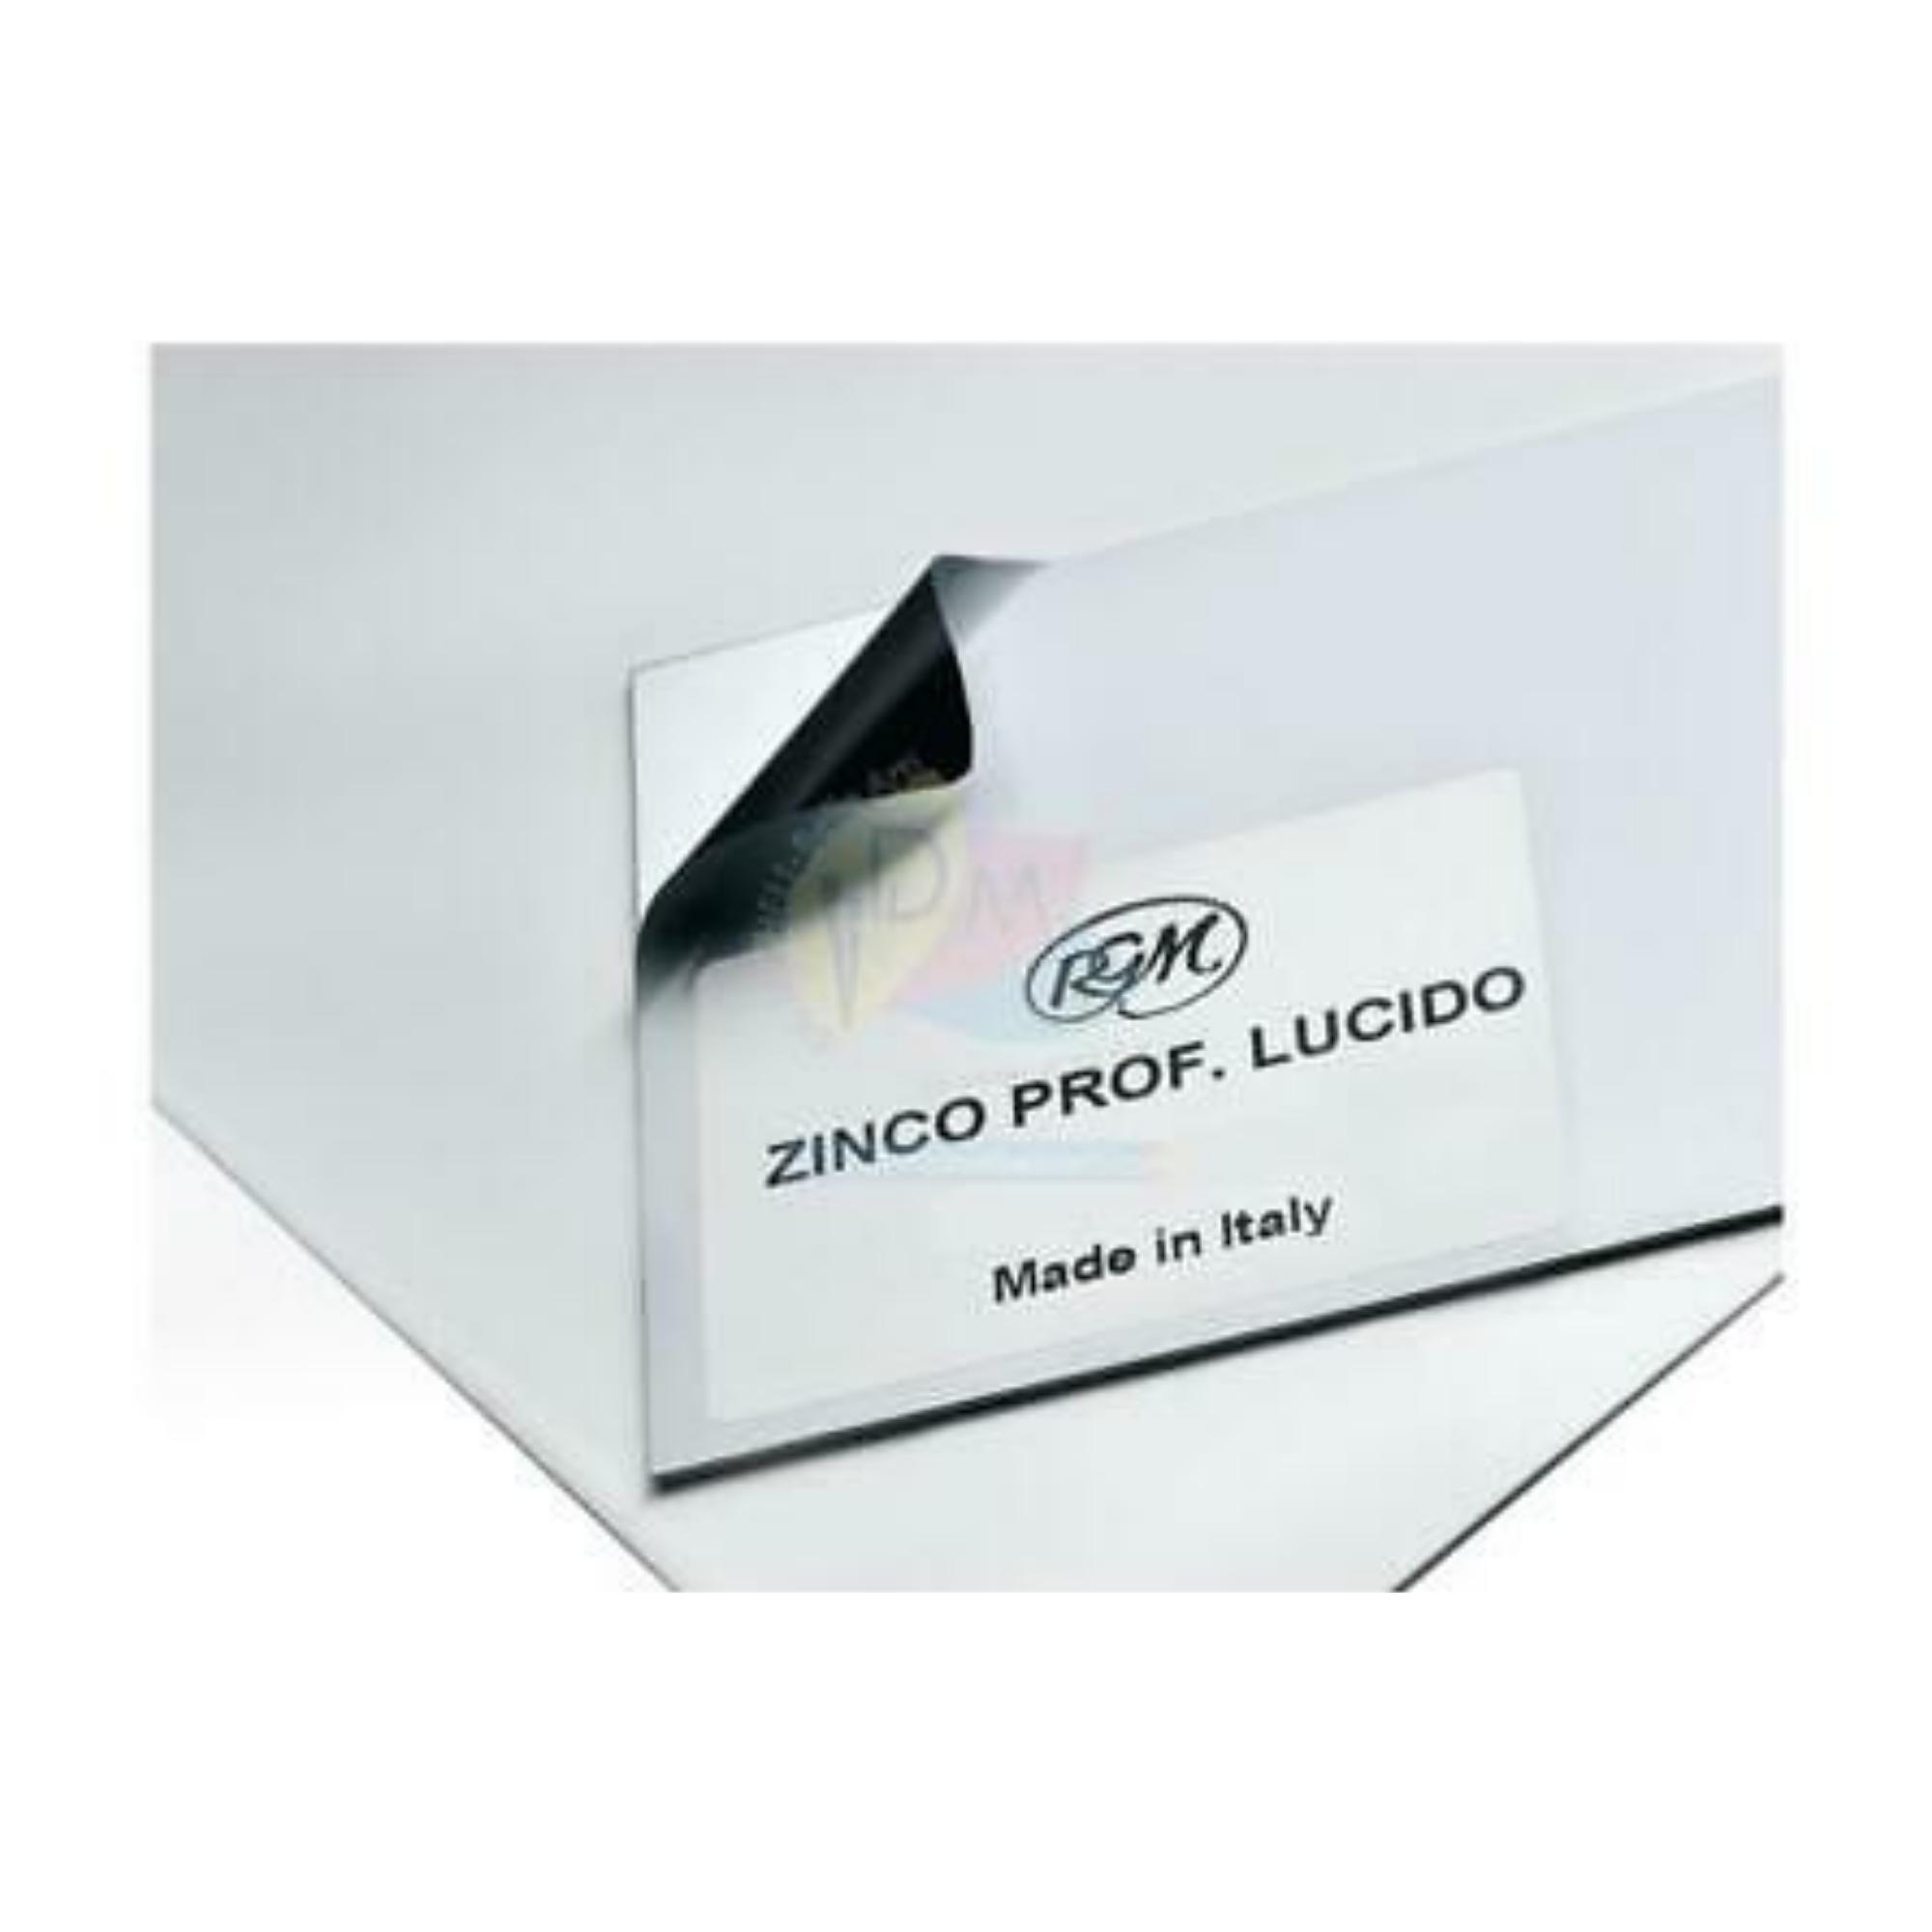 LÁMINA DE METAL ZINC 1/8 35X25 CM 1MM GROSOR